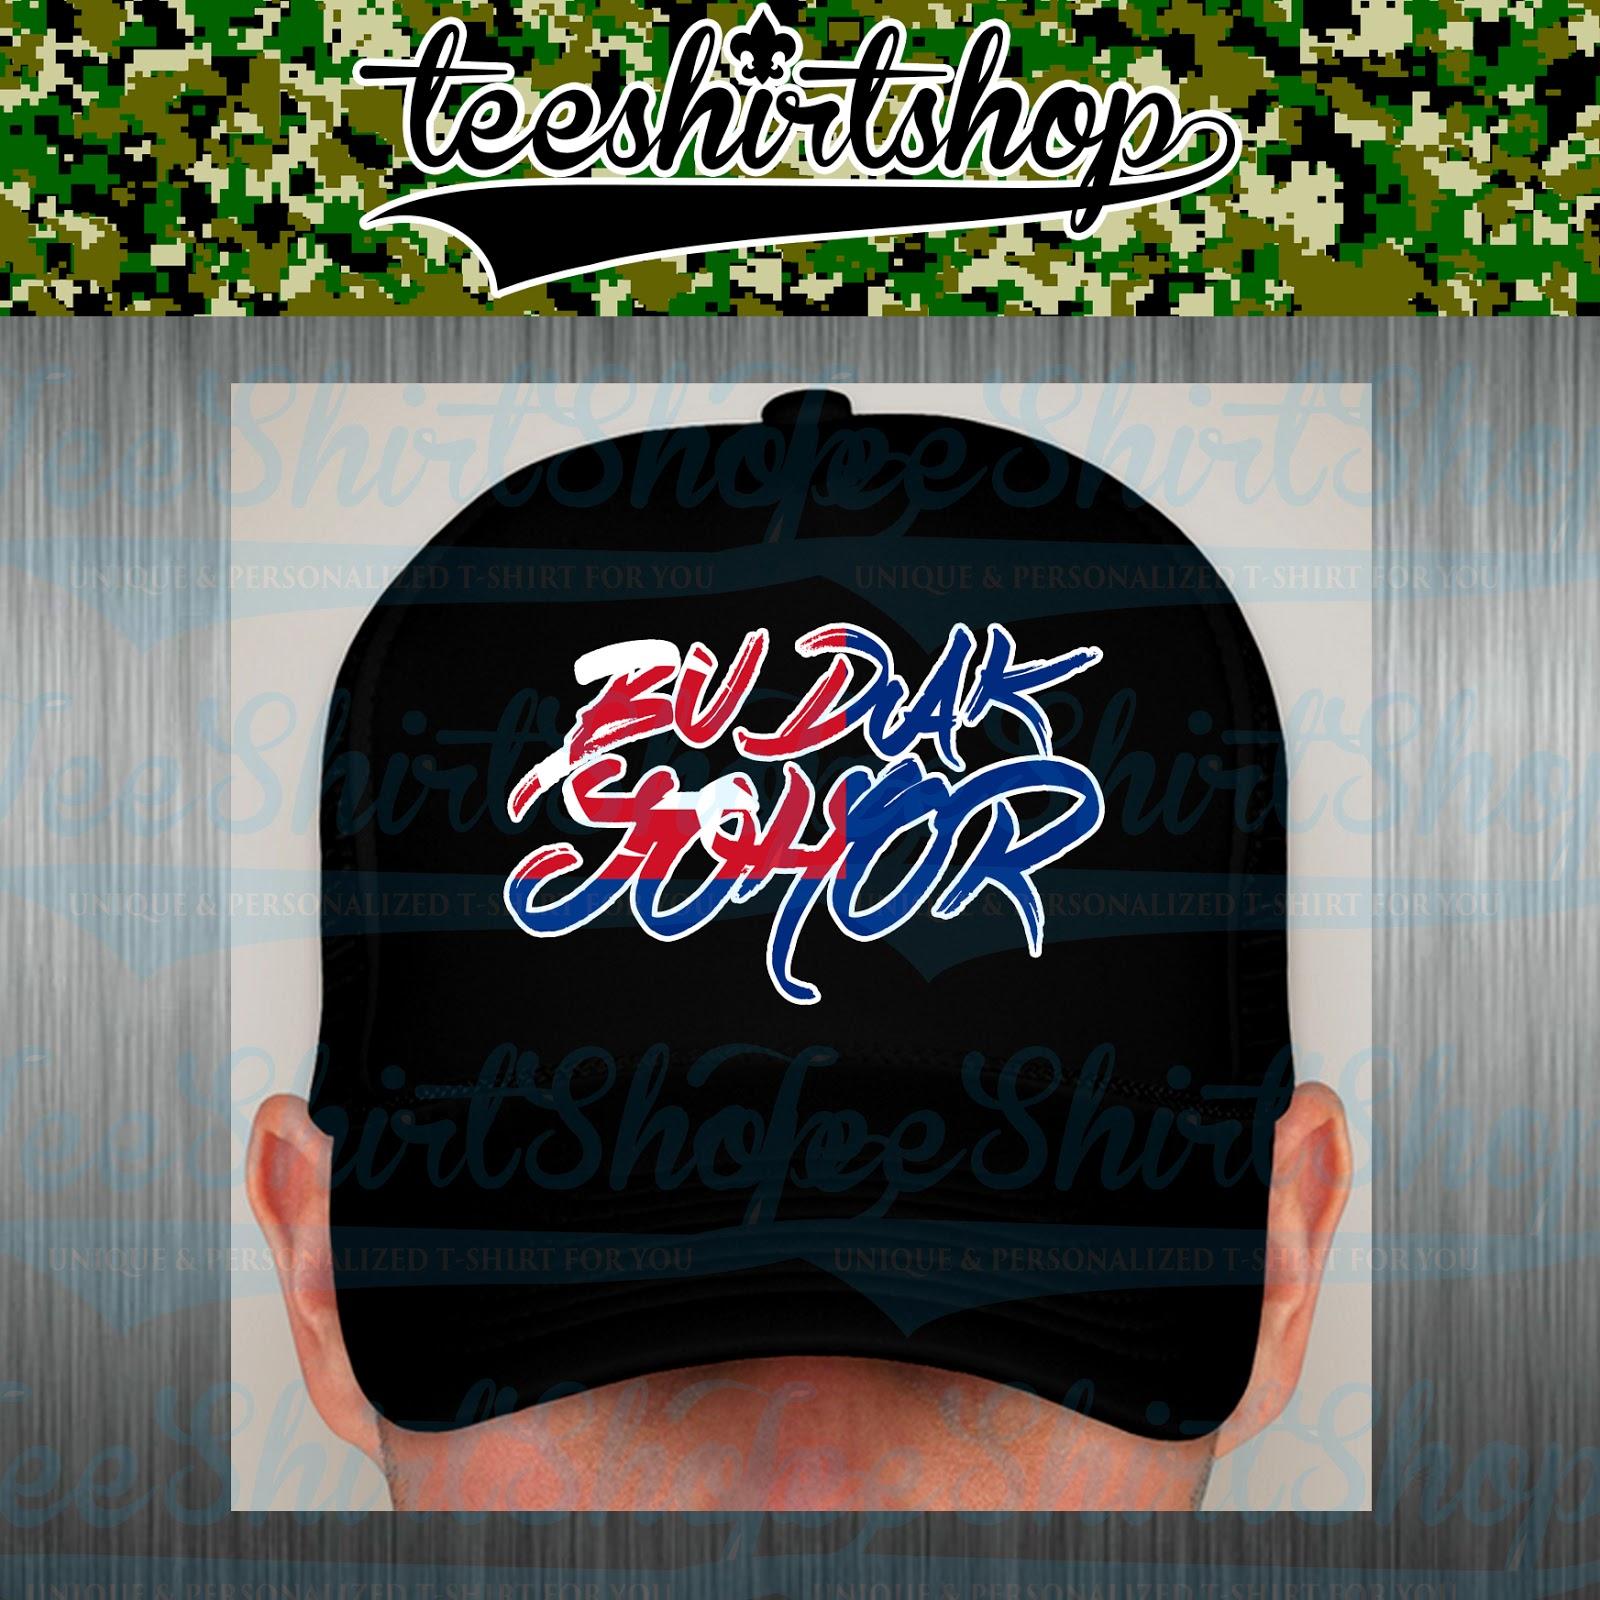 Design t shirt johor - Website Tee Shirtshop Blogspot Coom Mudah Store Httpa Mudah My Teeshirtshop